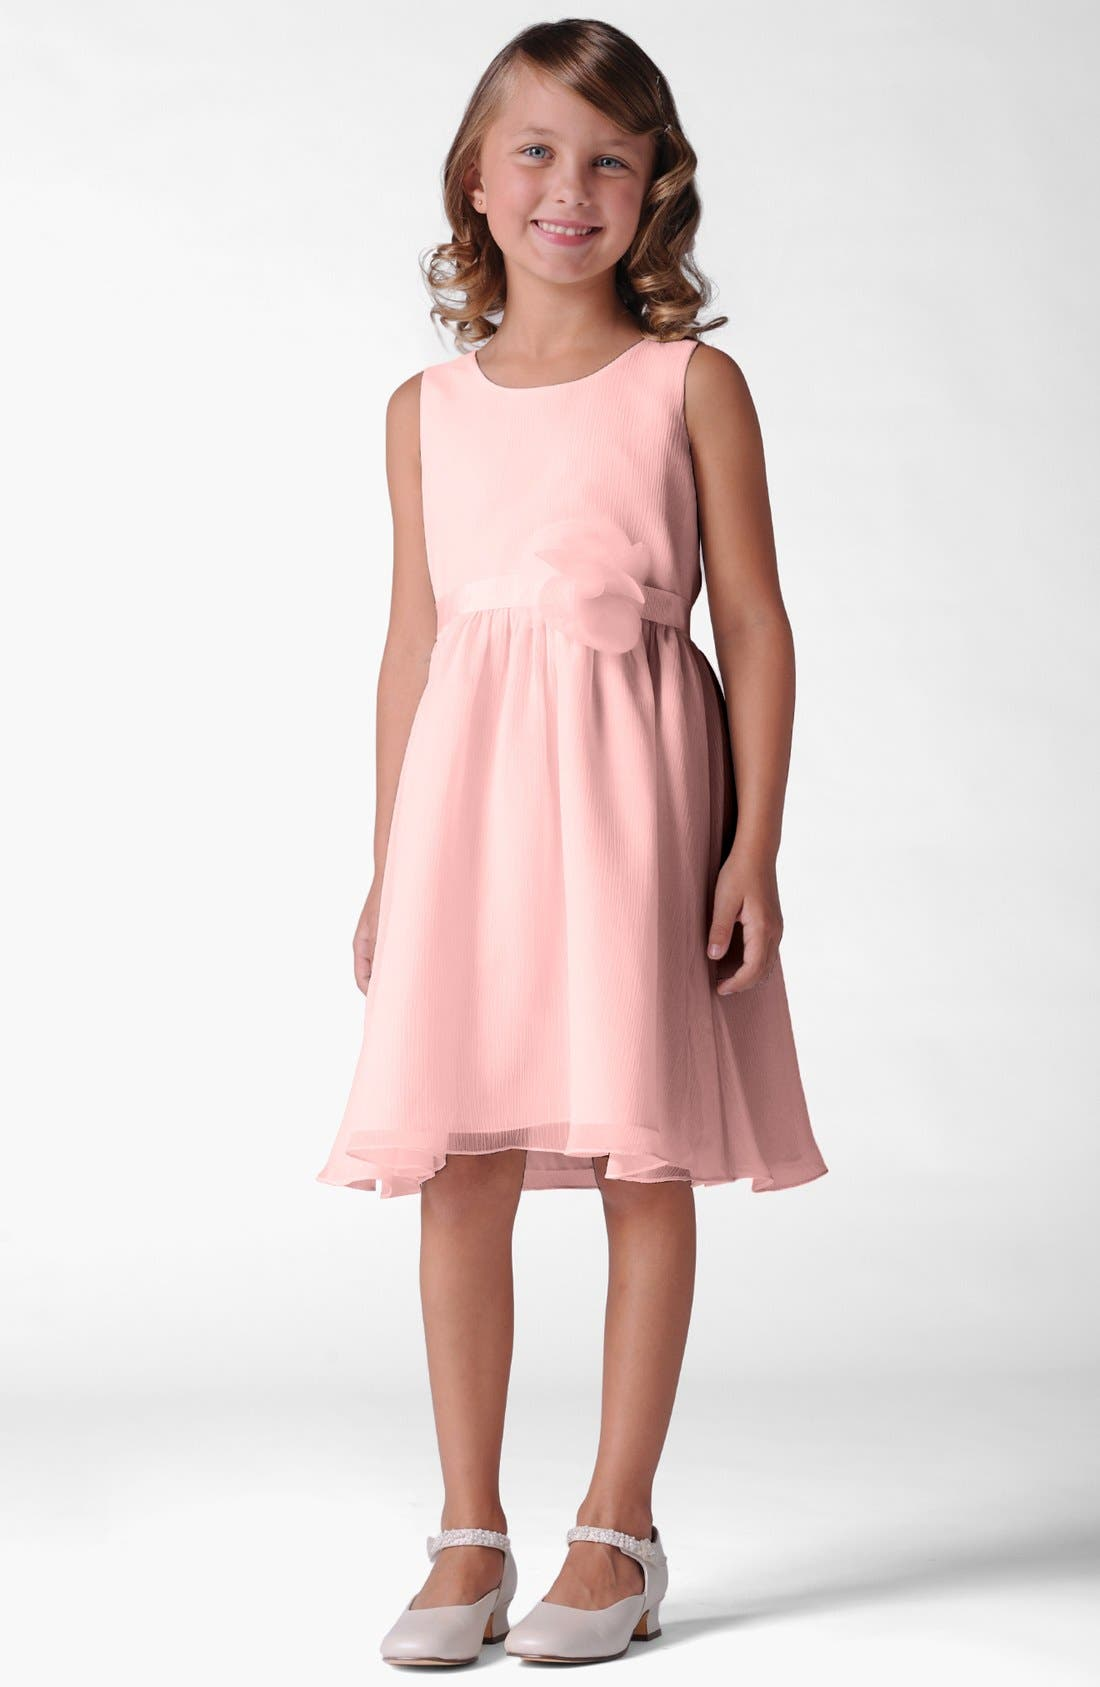 Alternate Image 1 Selected - Us Angels Sleeveless Chiffon Dress (Little Girls & Big Girls)